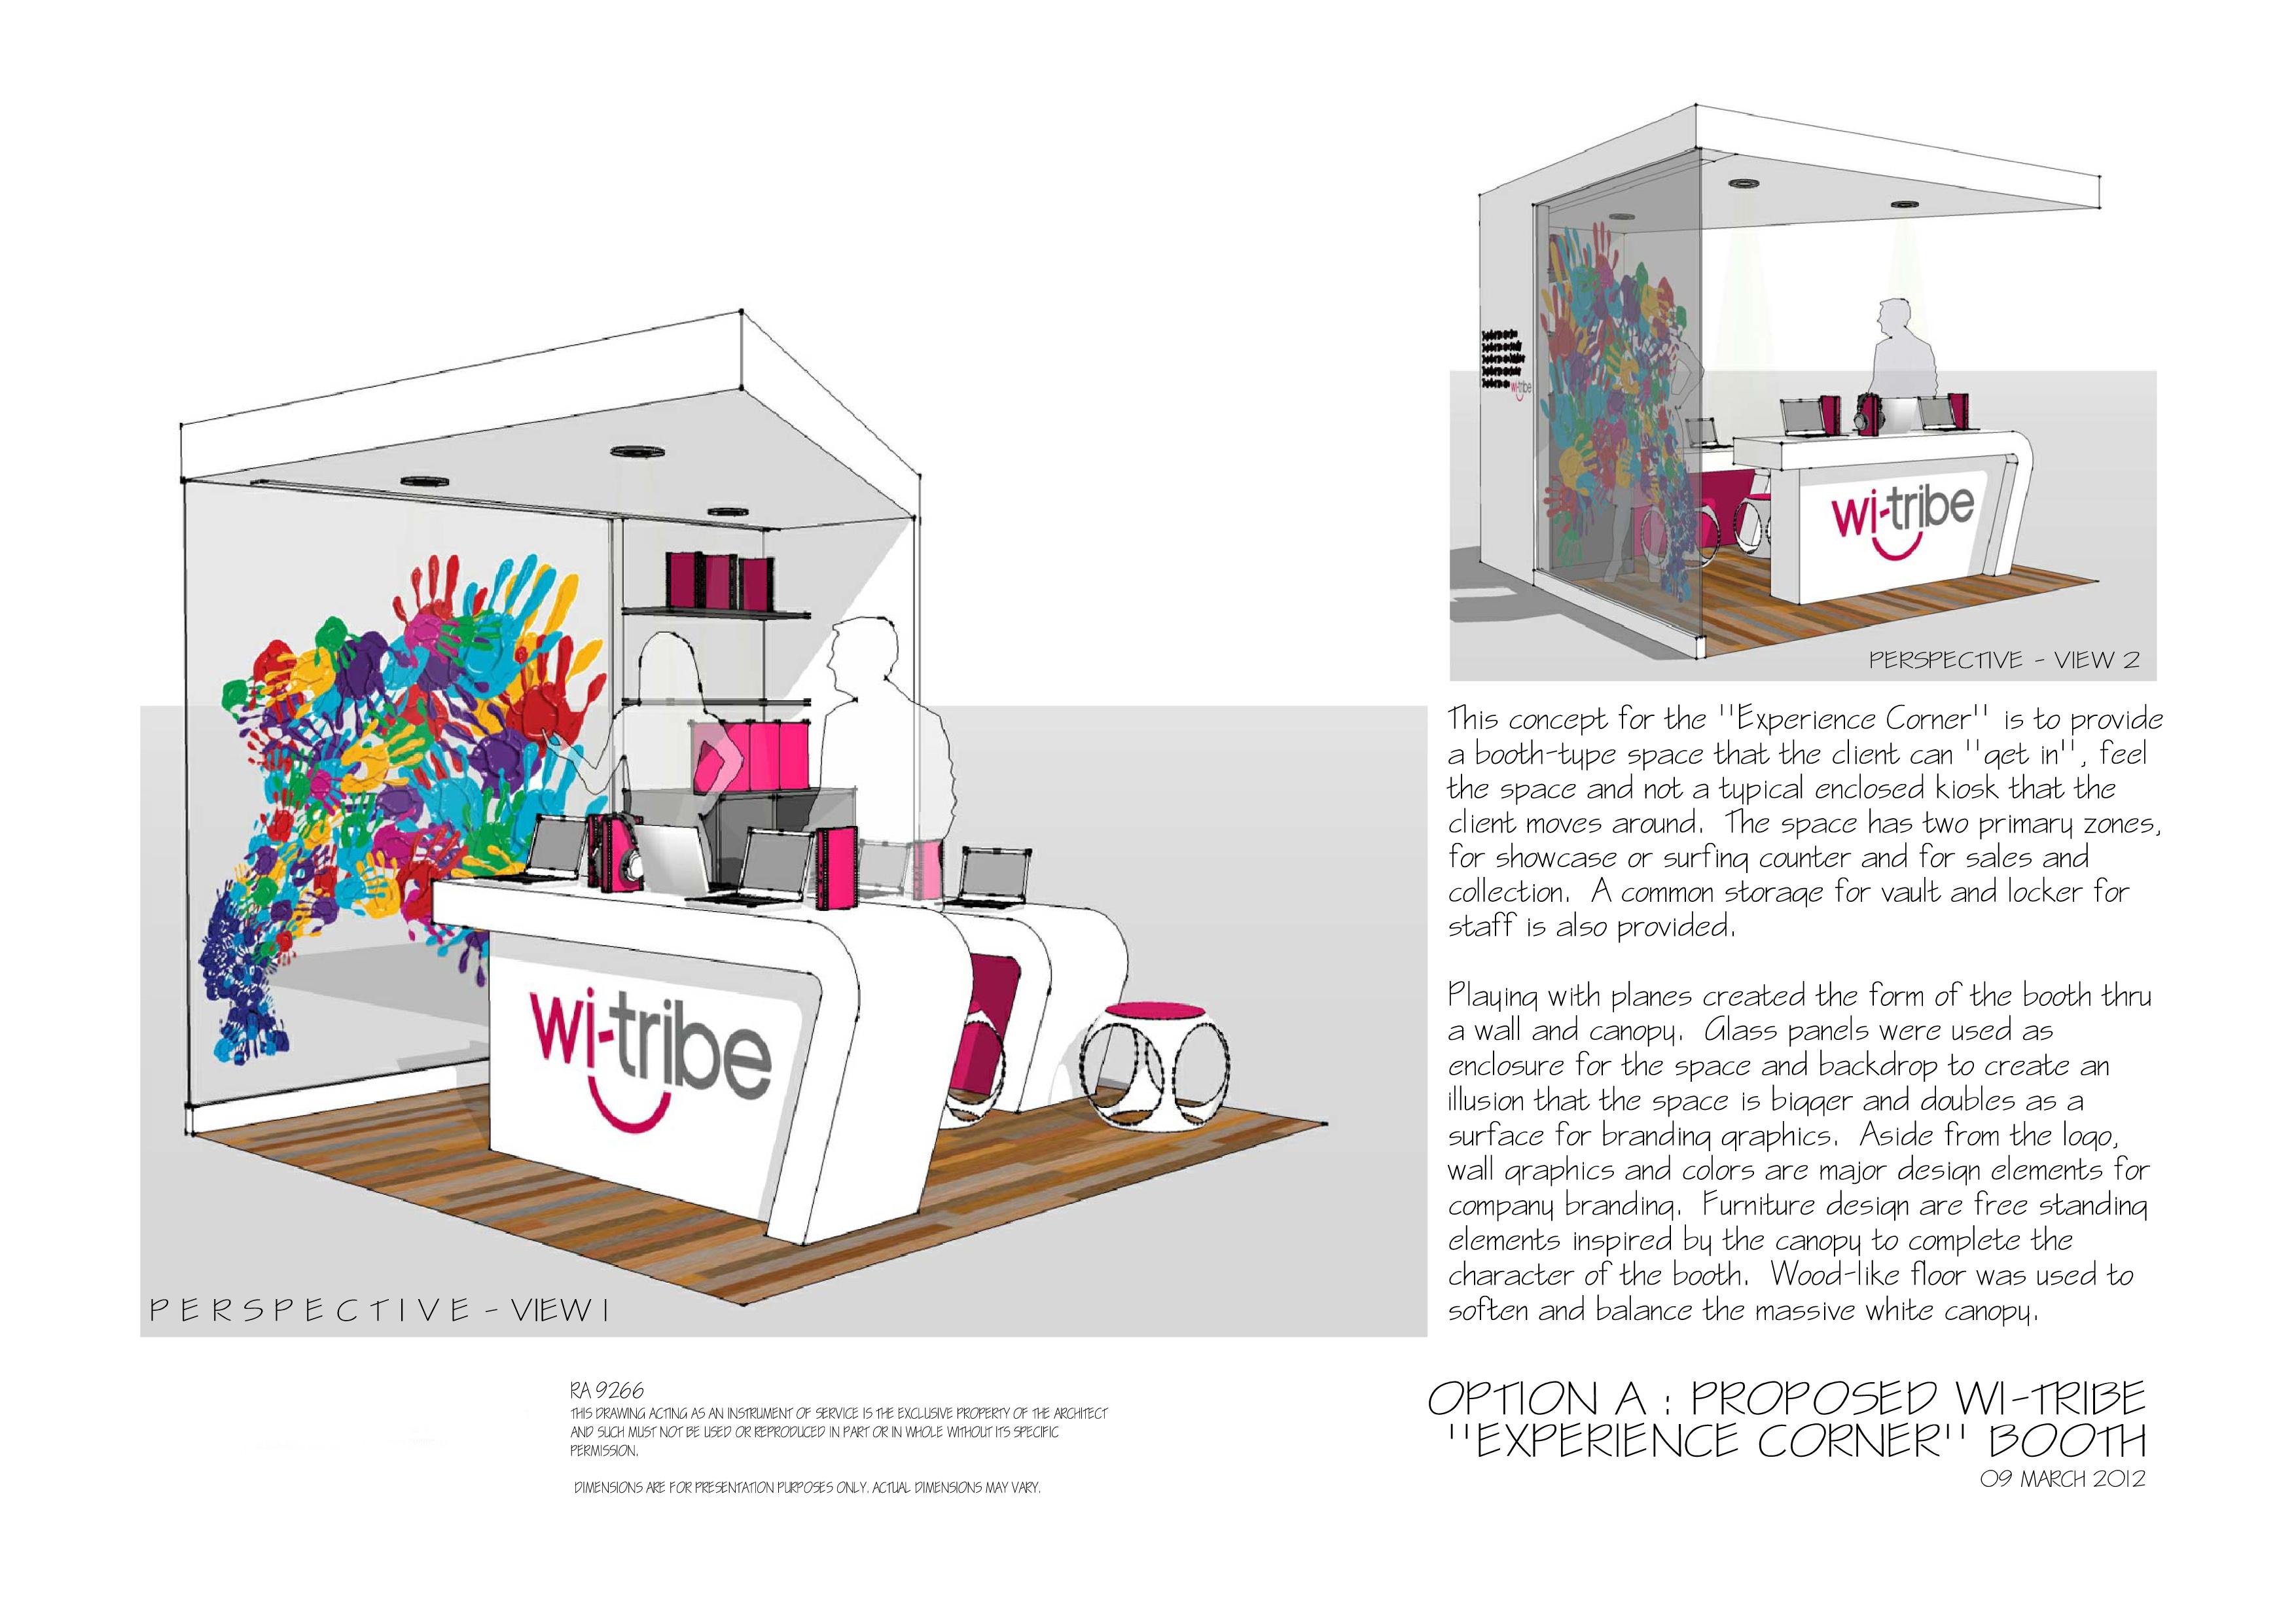 Architecture And Interior Design By Michelle Anne Santos At Coroflot